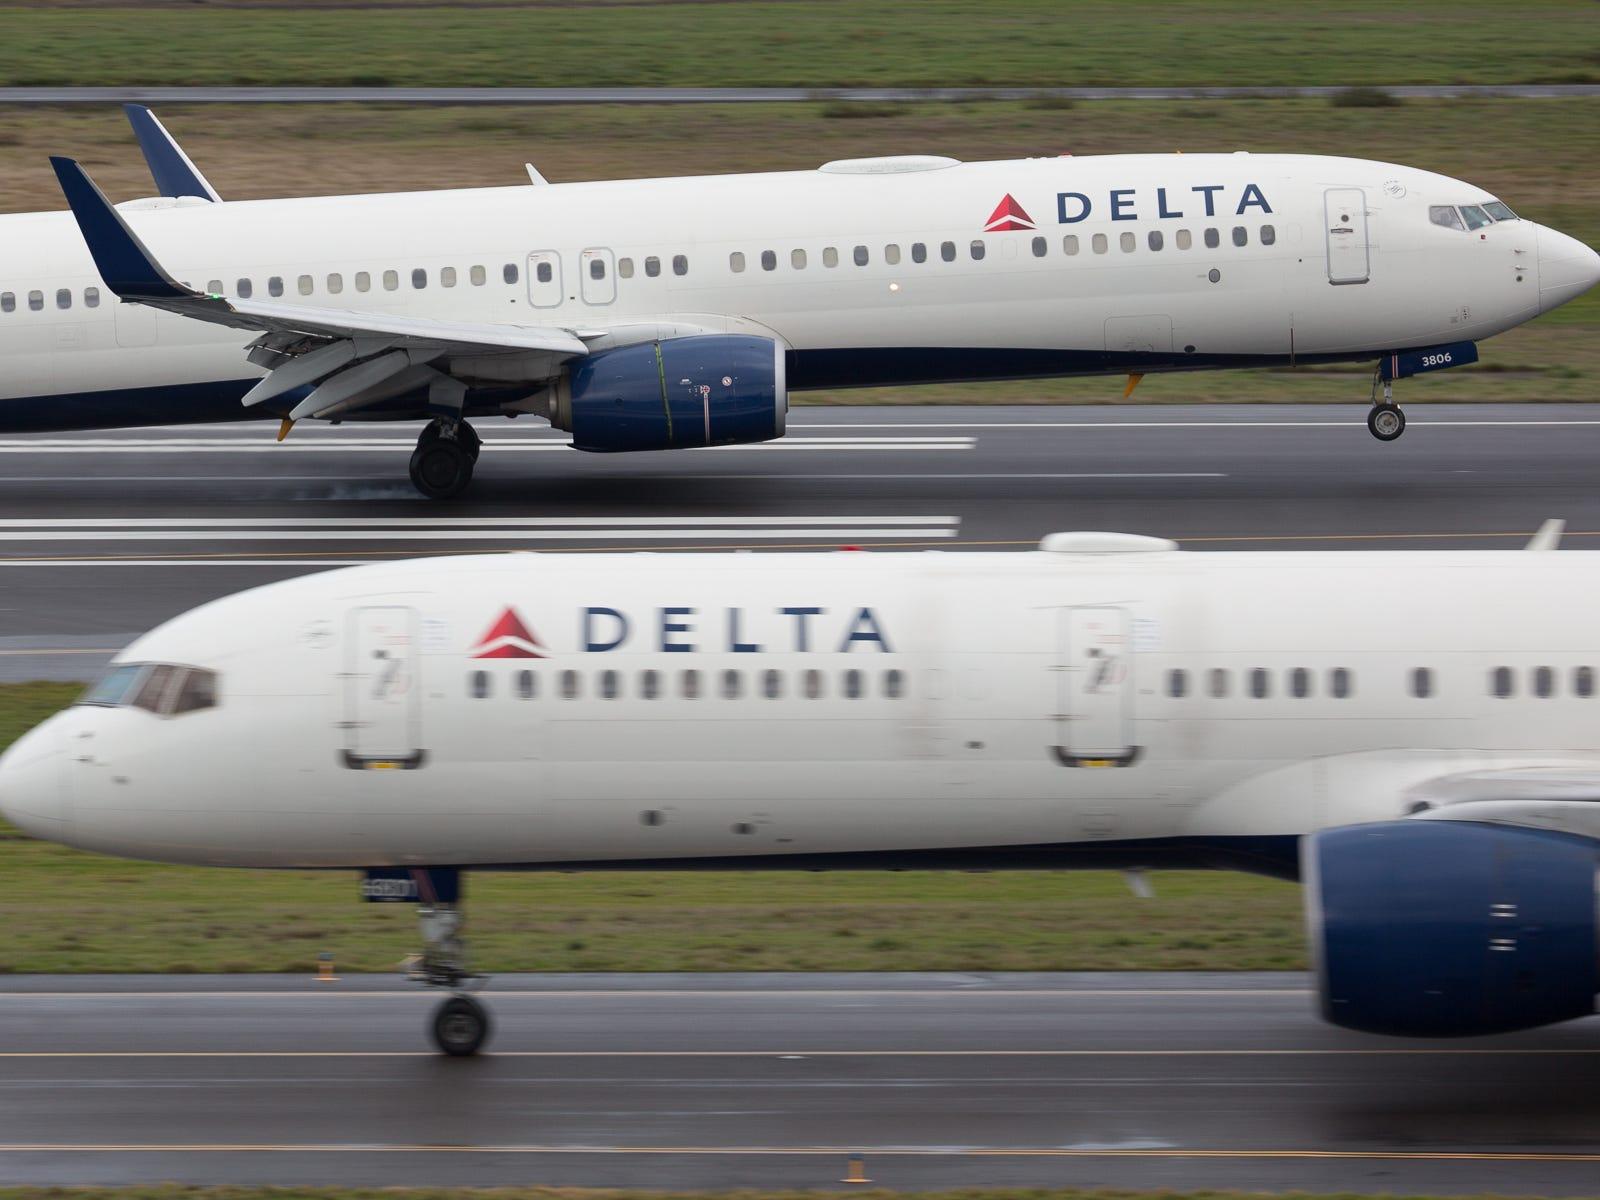 Delta Air Lines jets at Portland International Airport in December 2018.